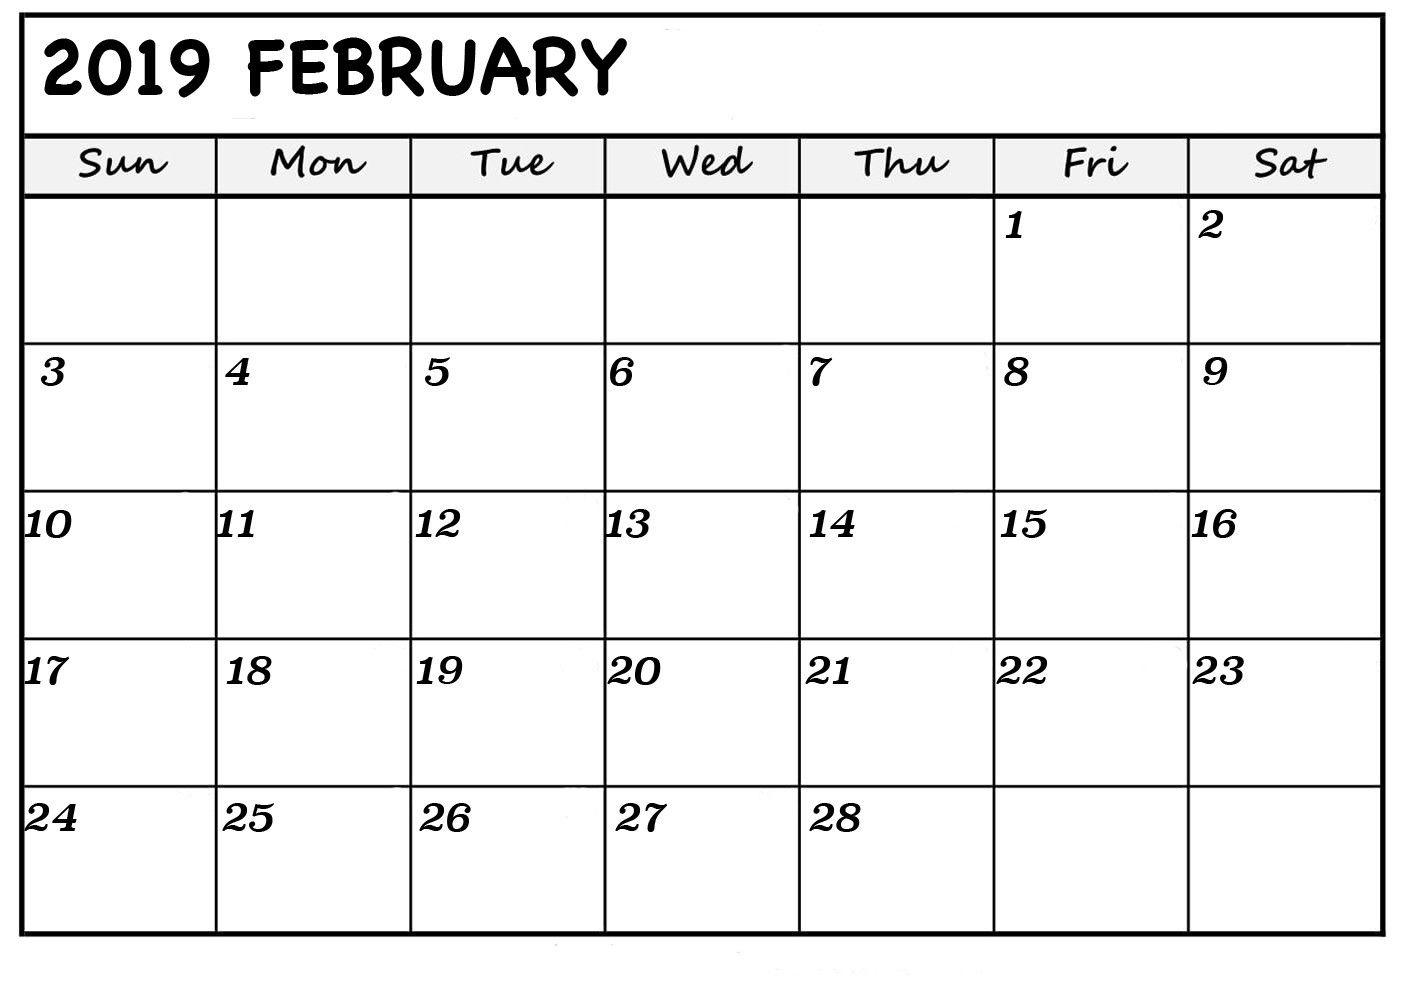 Editable February 2019 Calendar - Free Printable Calendar, Templates within Free Fillable Blank Calendar Templates